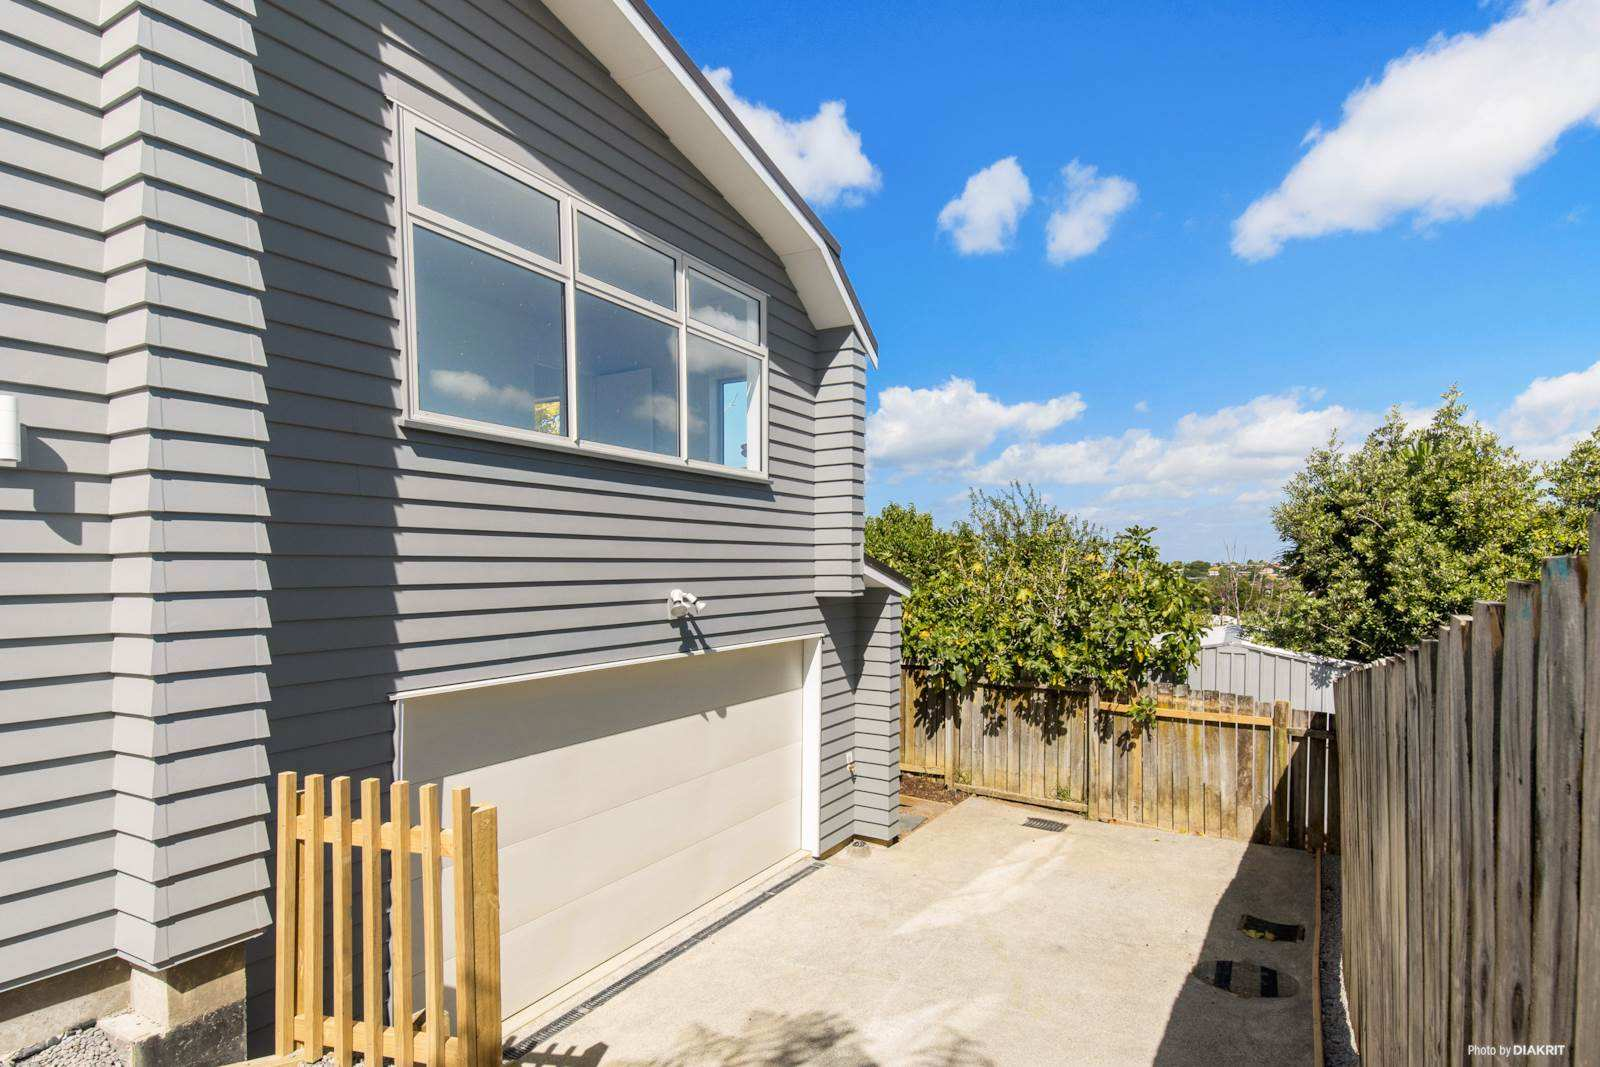 Hillcrest 3房 全新摩登城市屋 以可负担价格 臻享高品位生活 棣属优质校网 机遇不容错过! Affordable Brand New home in Hillcrest!